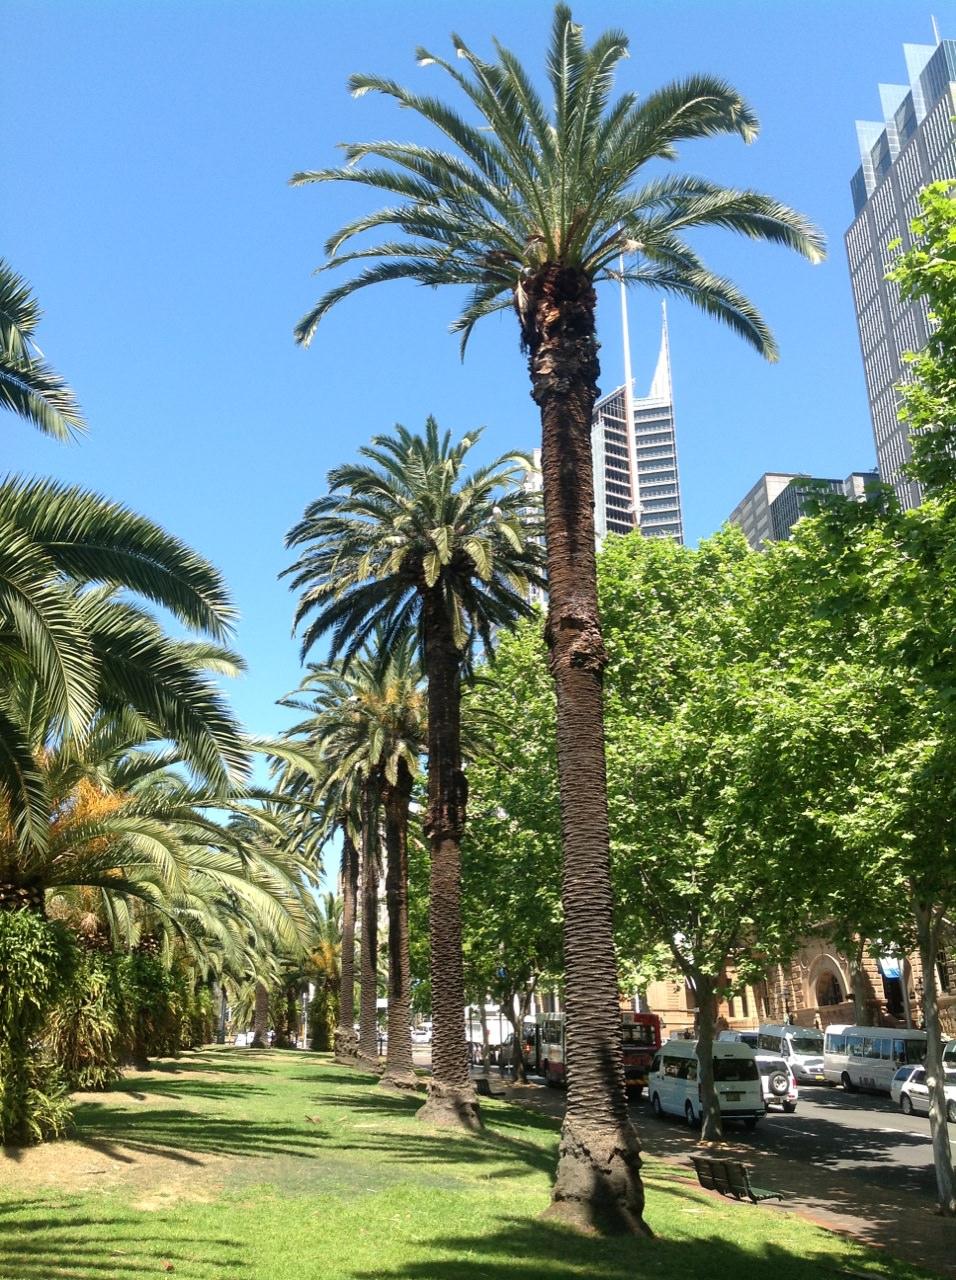 Canary Island Date Palms